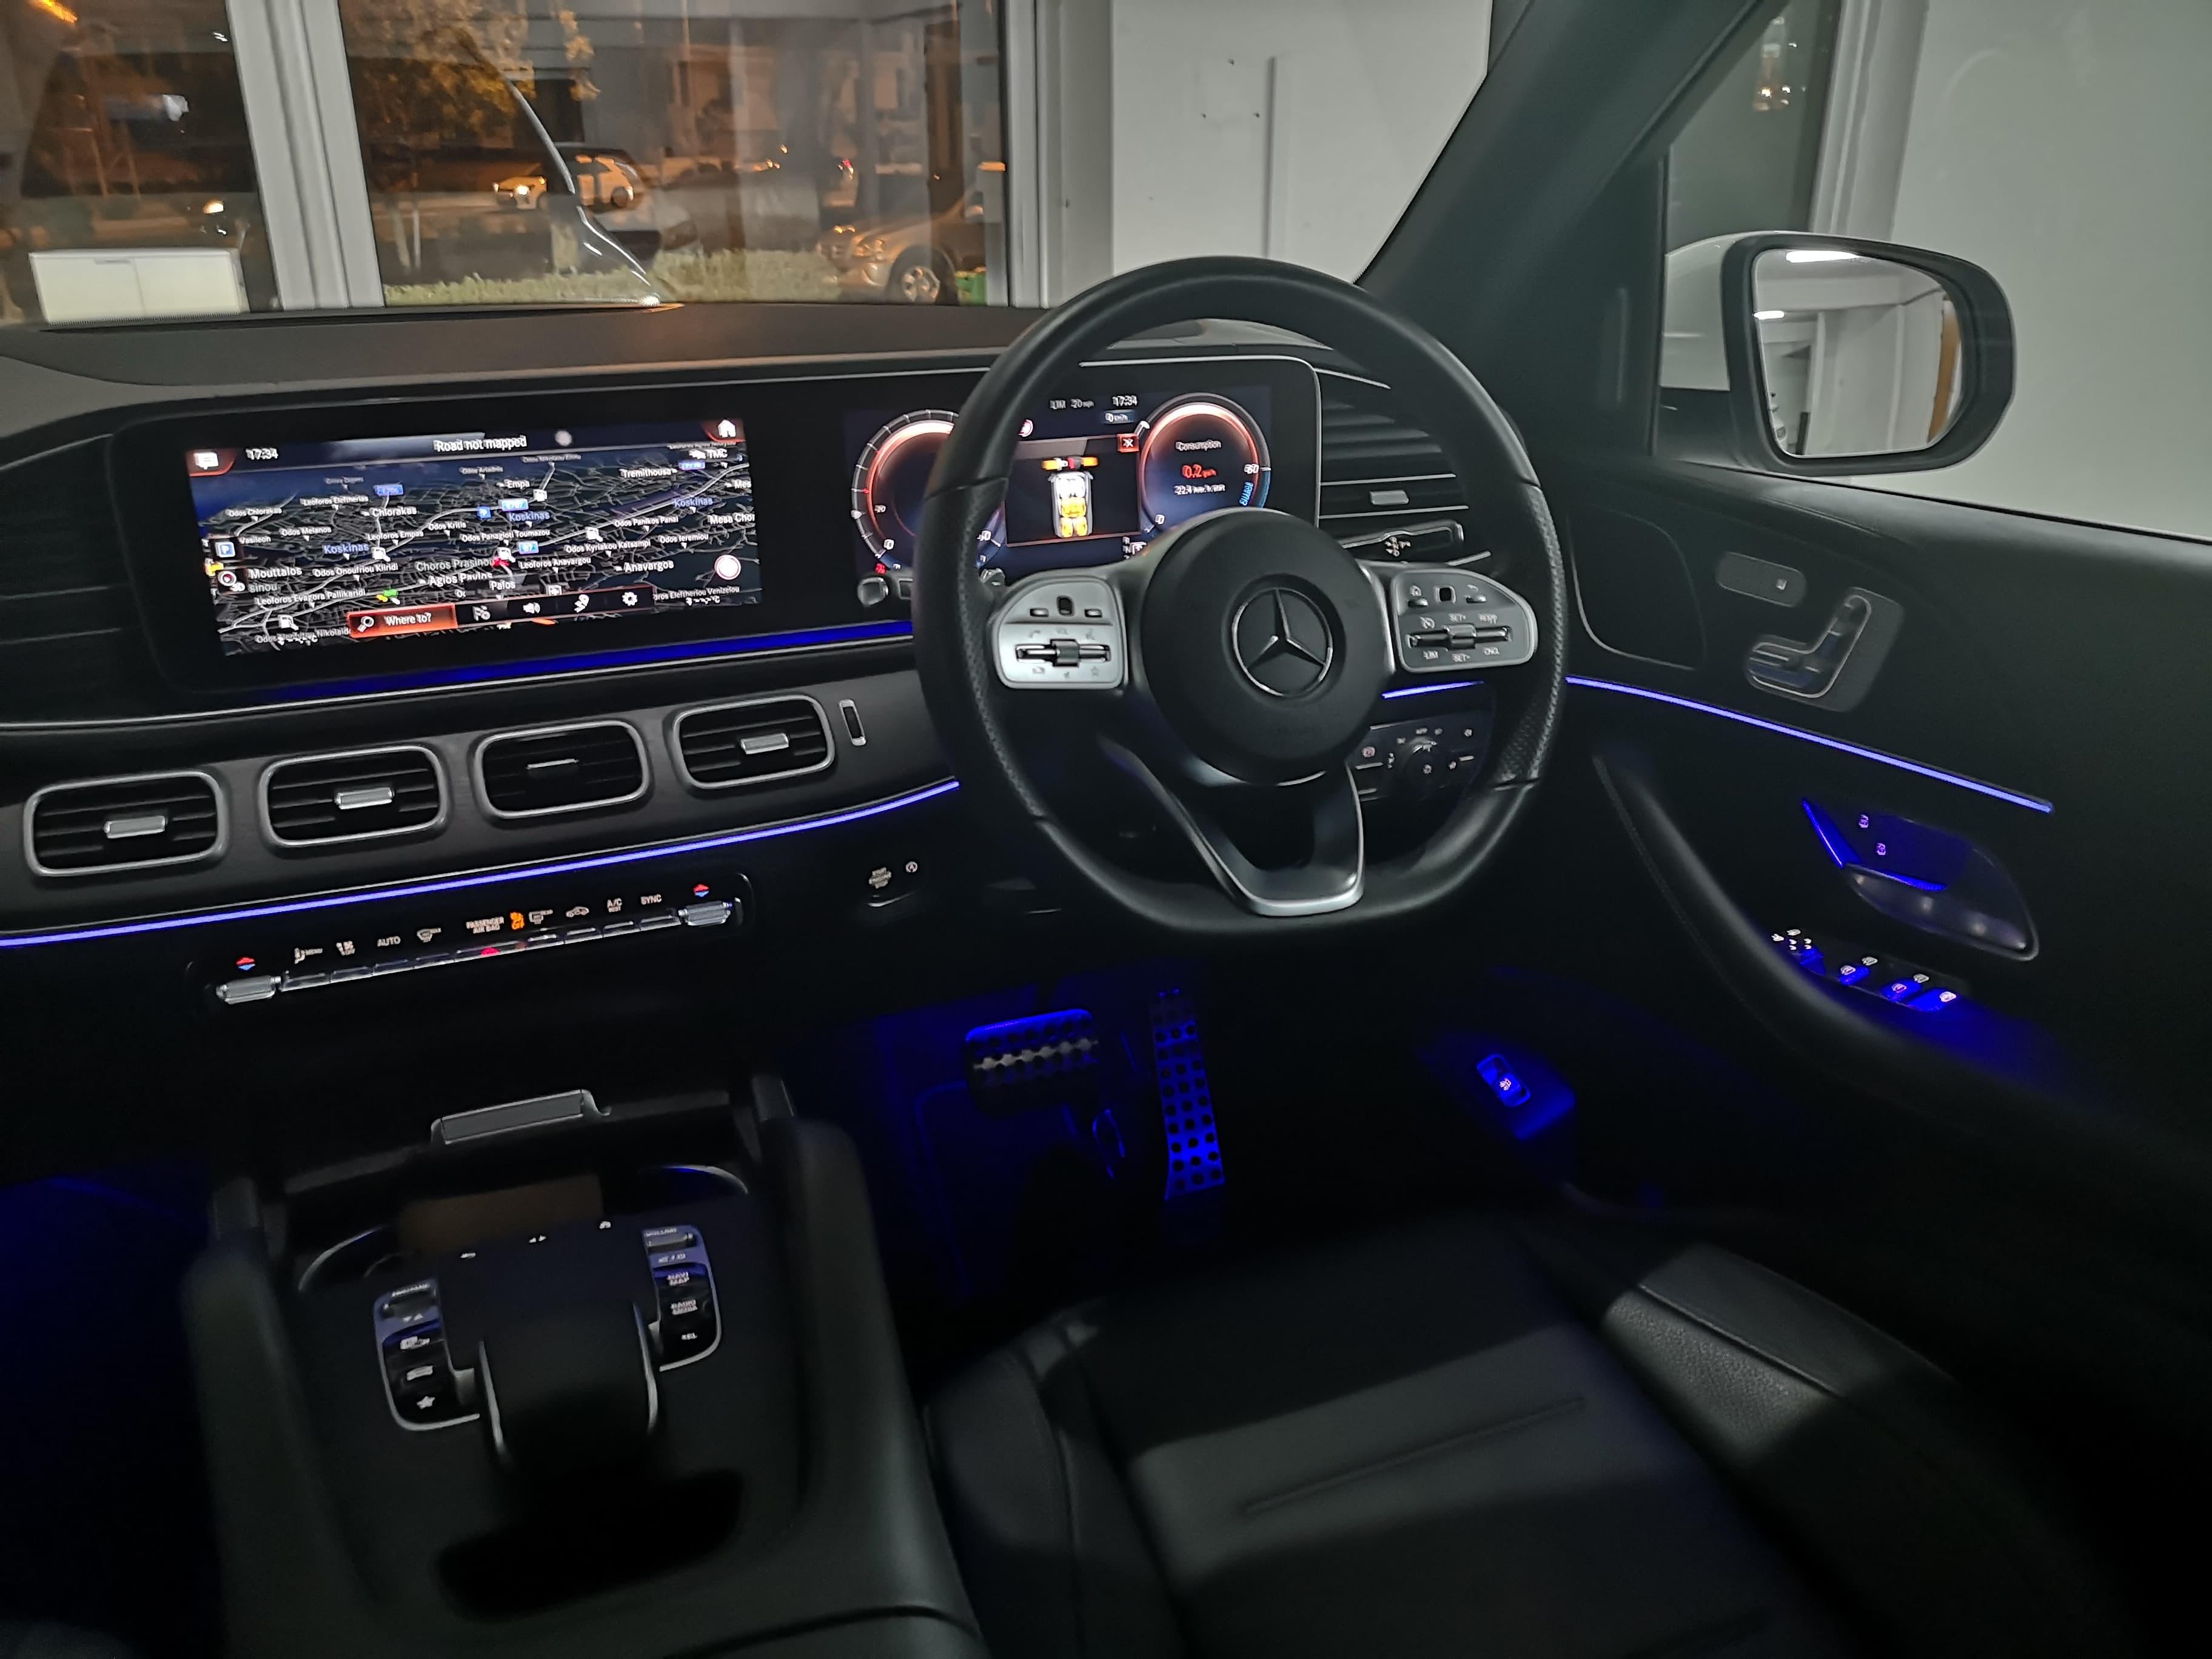 Mercedes GLE 300 D 4MATIC AMG LINE – 7 SEATS